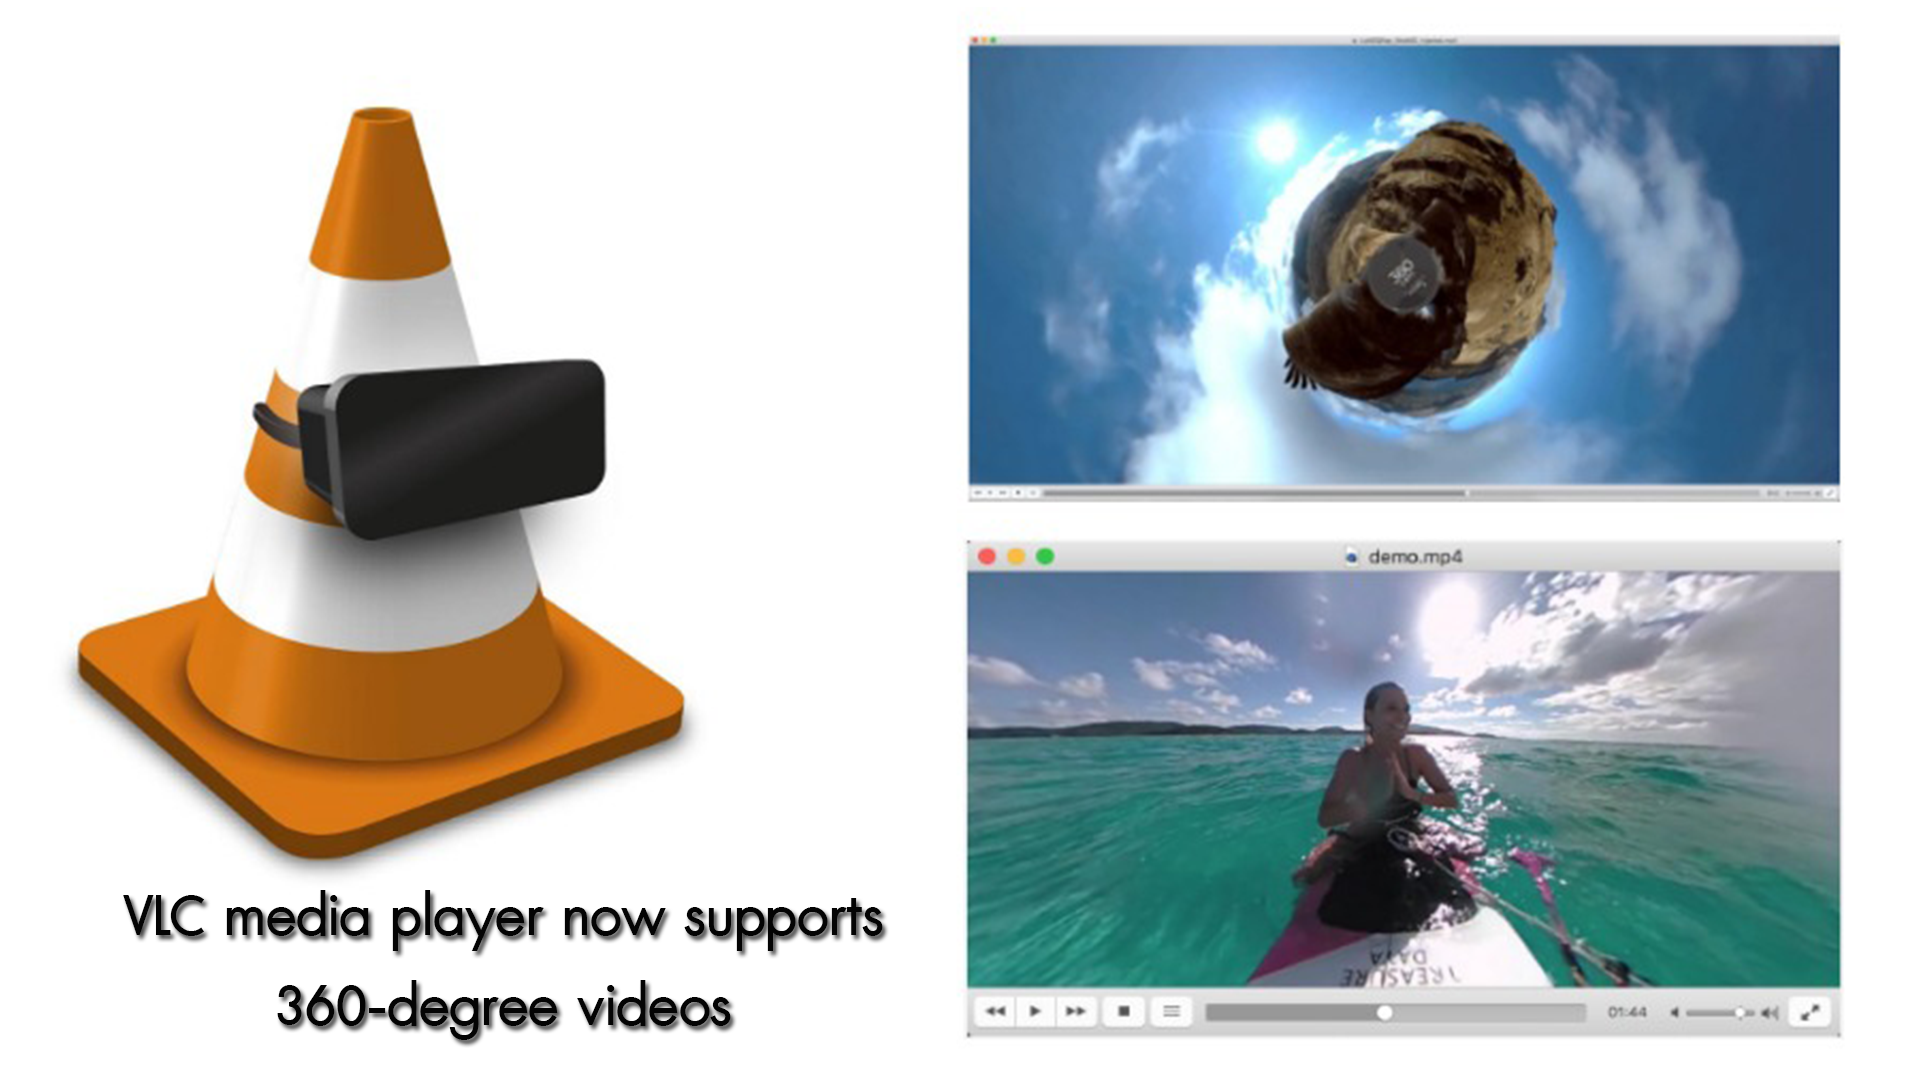 VLC Media Player โปรแกรมเล่นไฟล์ VDO ชื่อดังอัพเดทให้สามารถเล่น VDO และรูปภาพแลล 360 องศาได้แล้ว